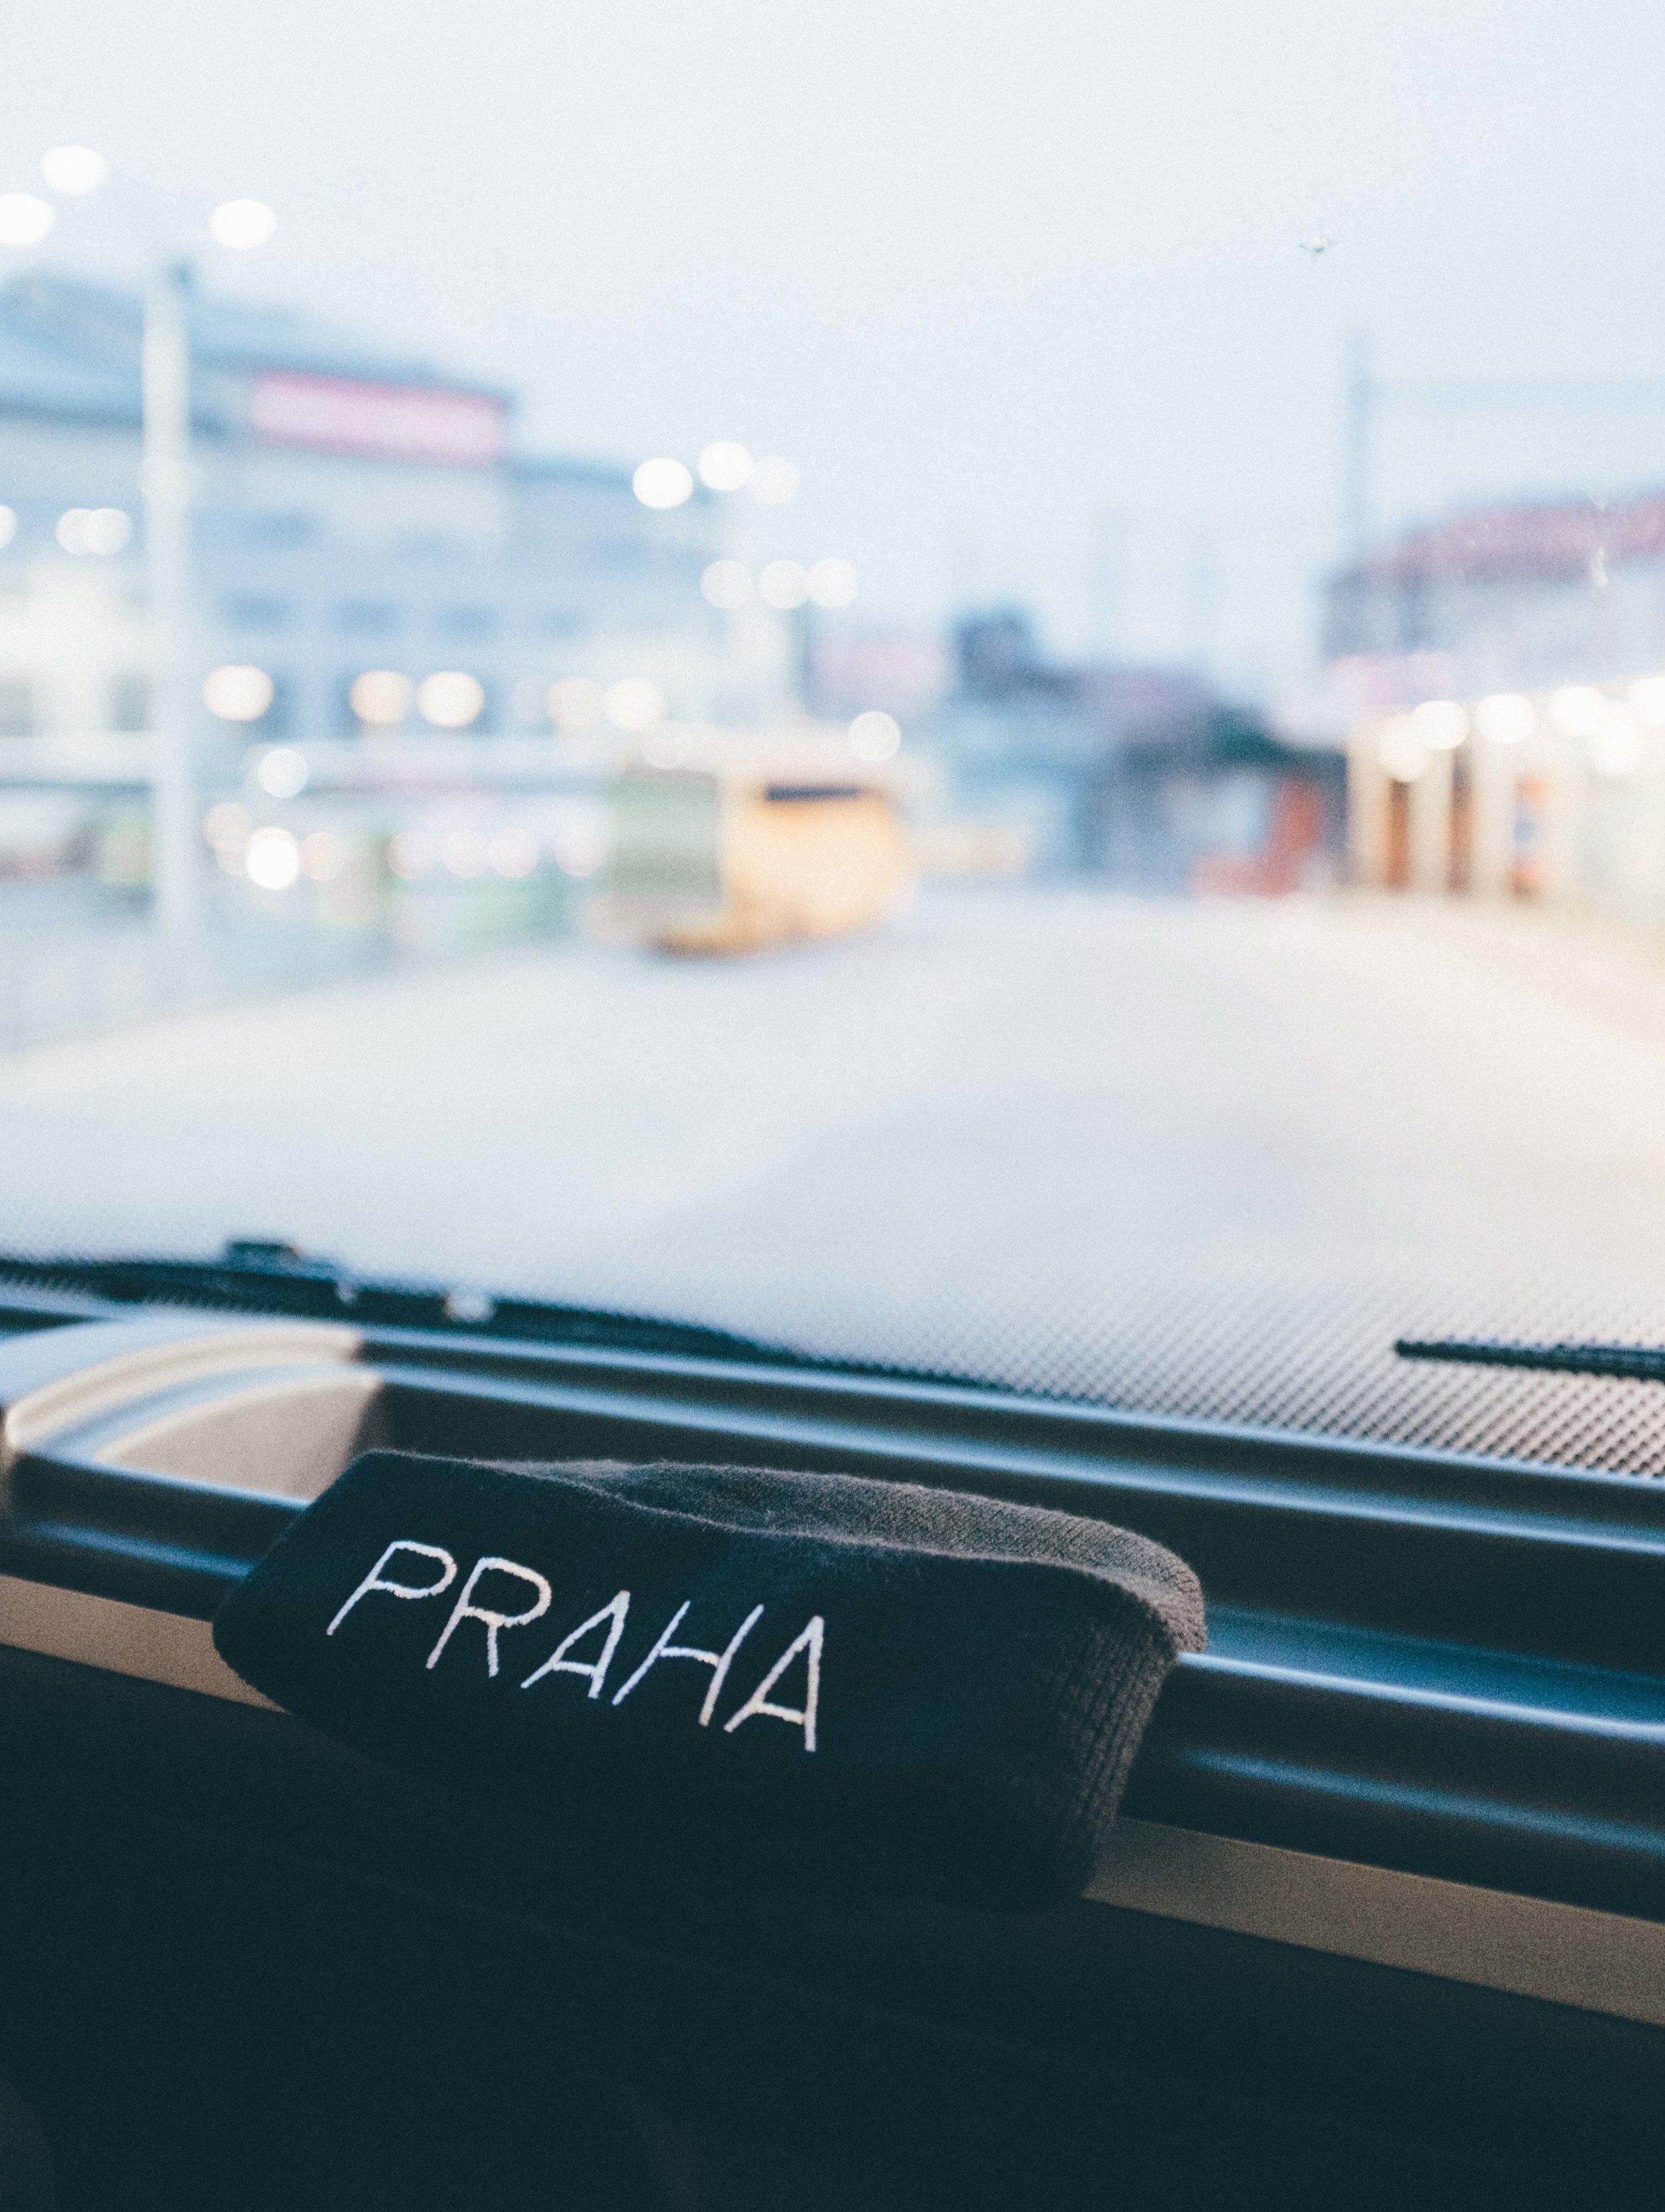 PRAHA-POTF-DSCF0881.jpg